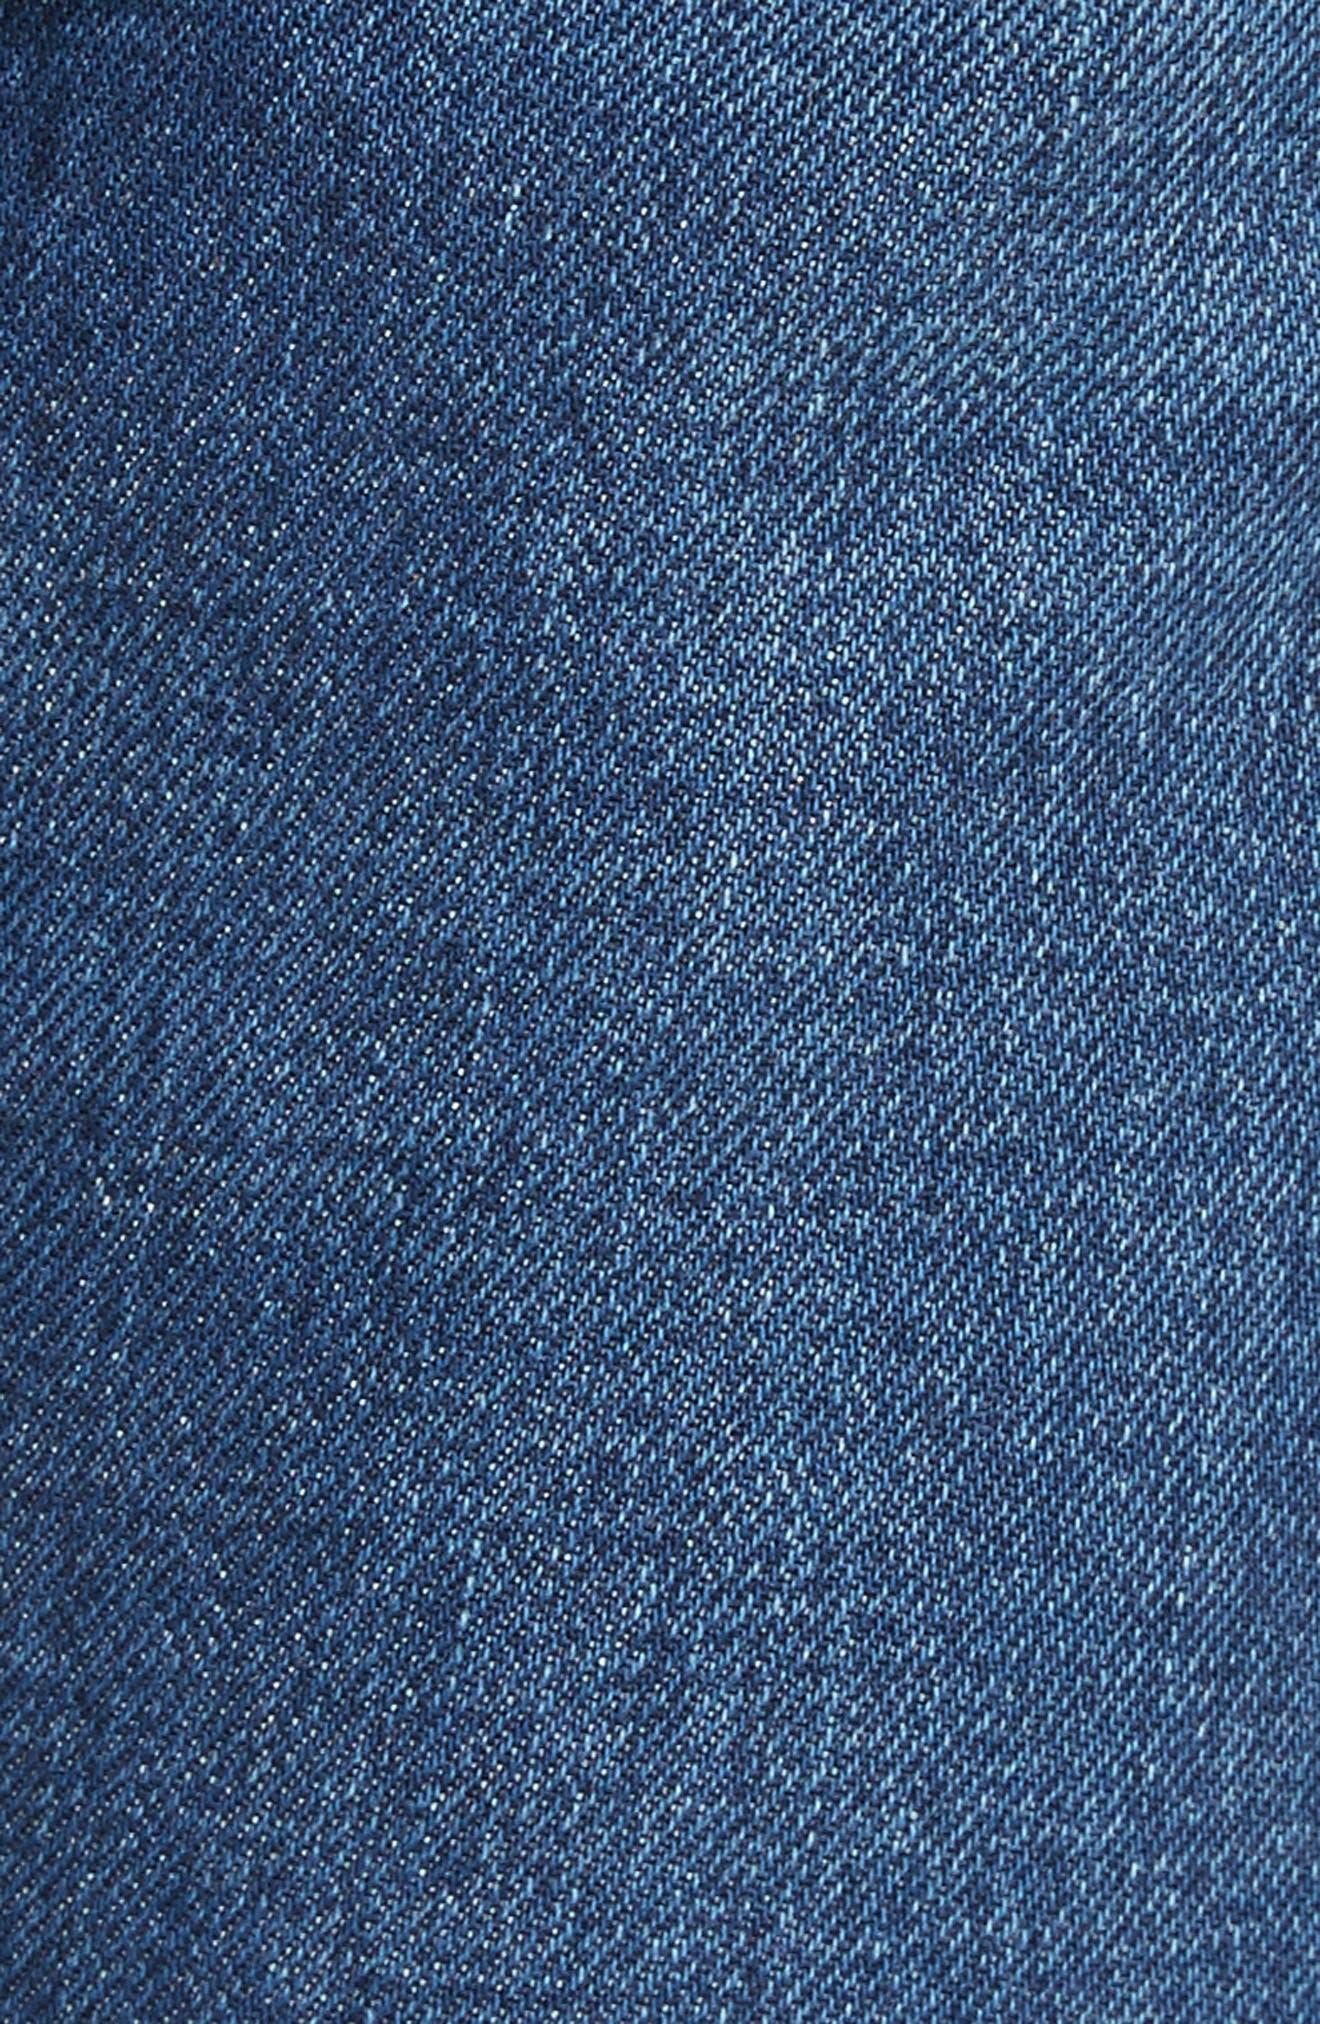 Alternate Image 5  - Saint Laurent Embroidered Jeans (Deep Dark Blue)